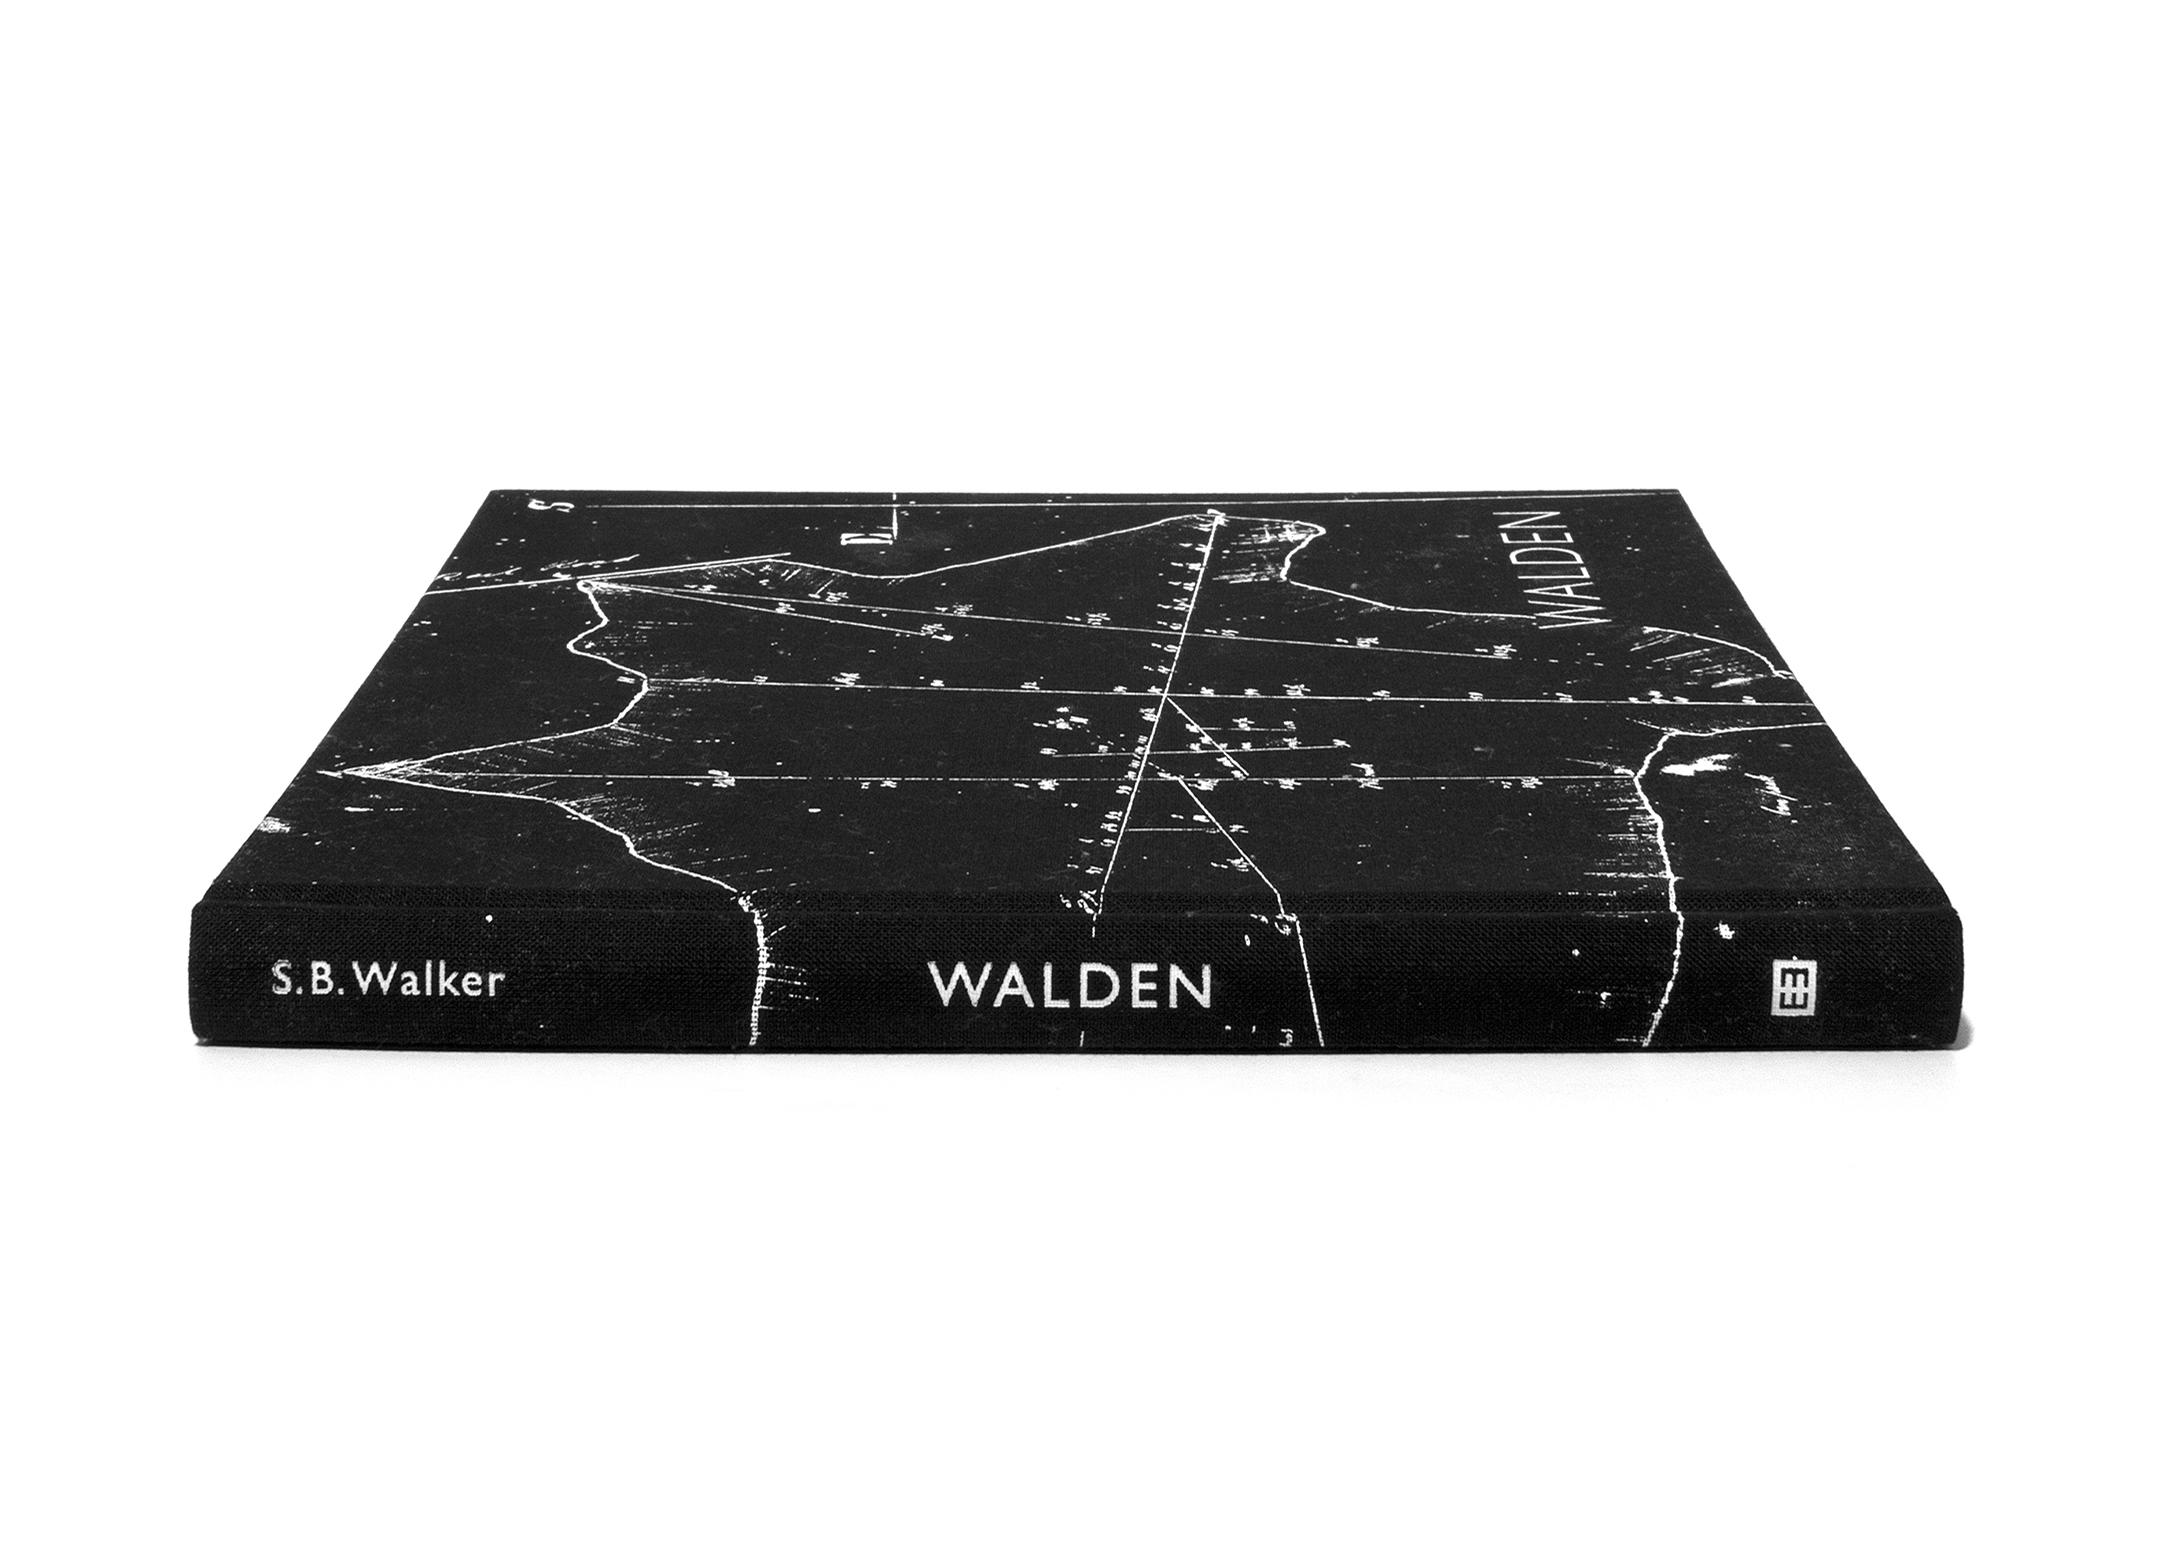 b2-walden-sb_walker.jpg